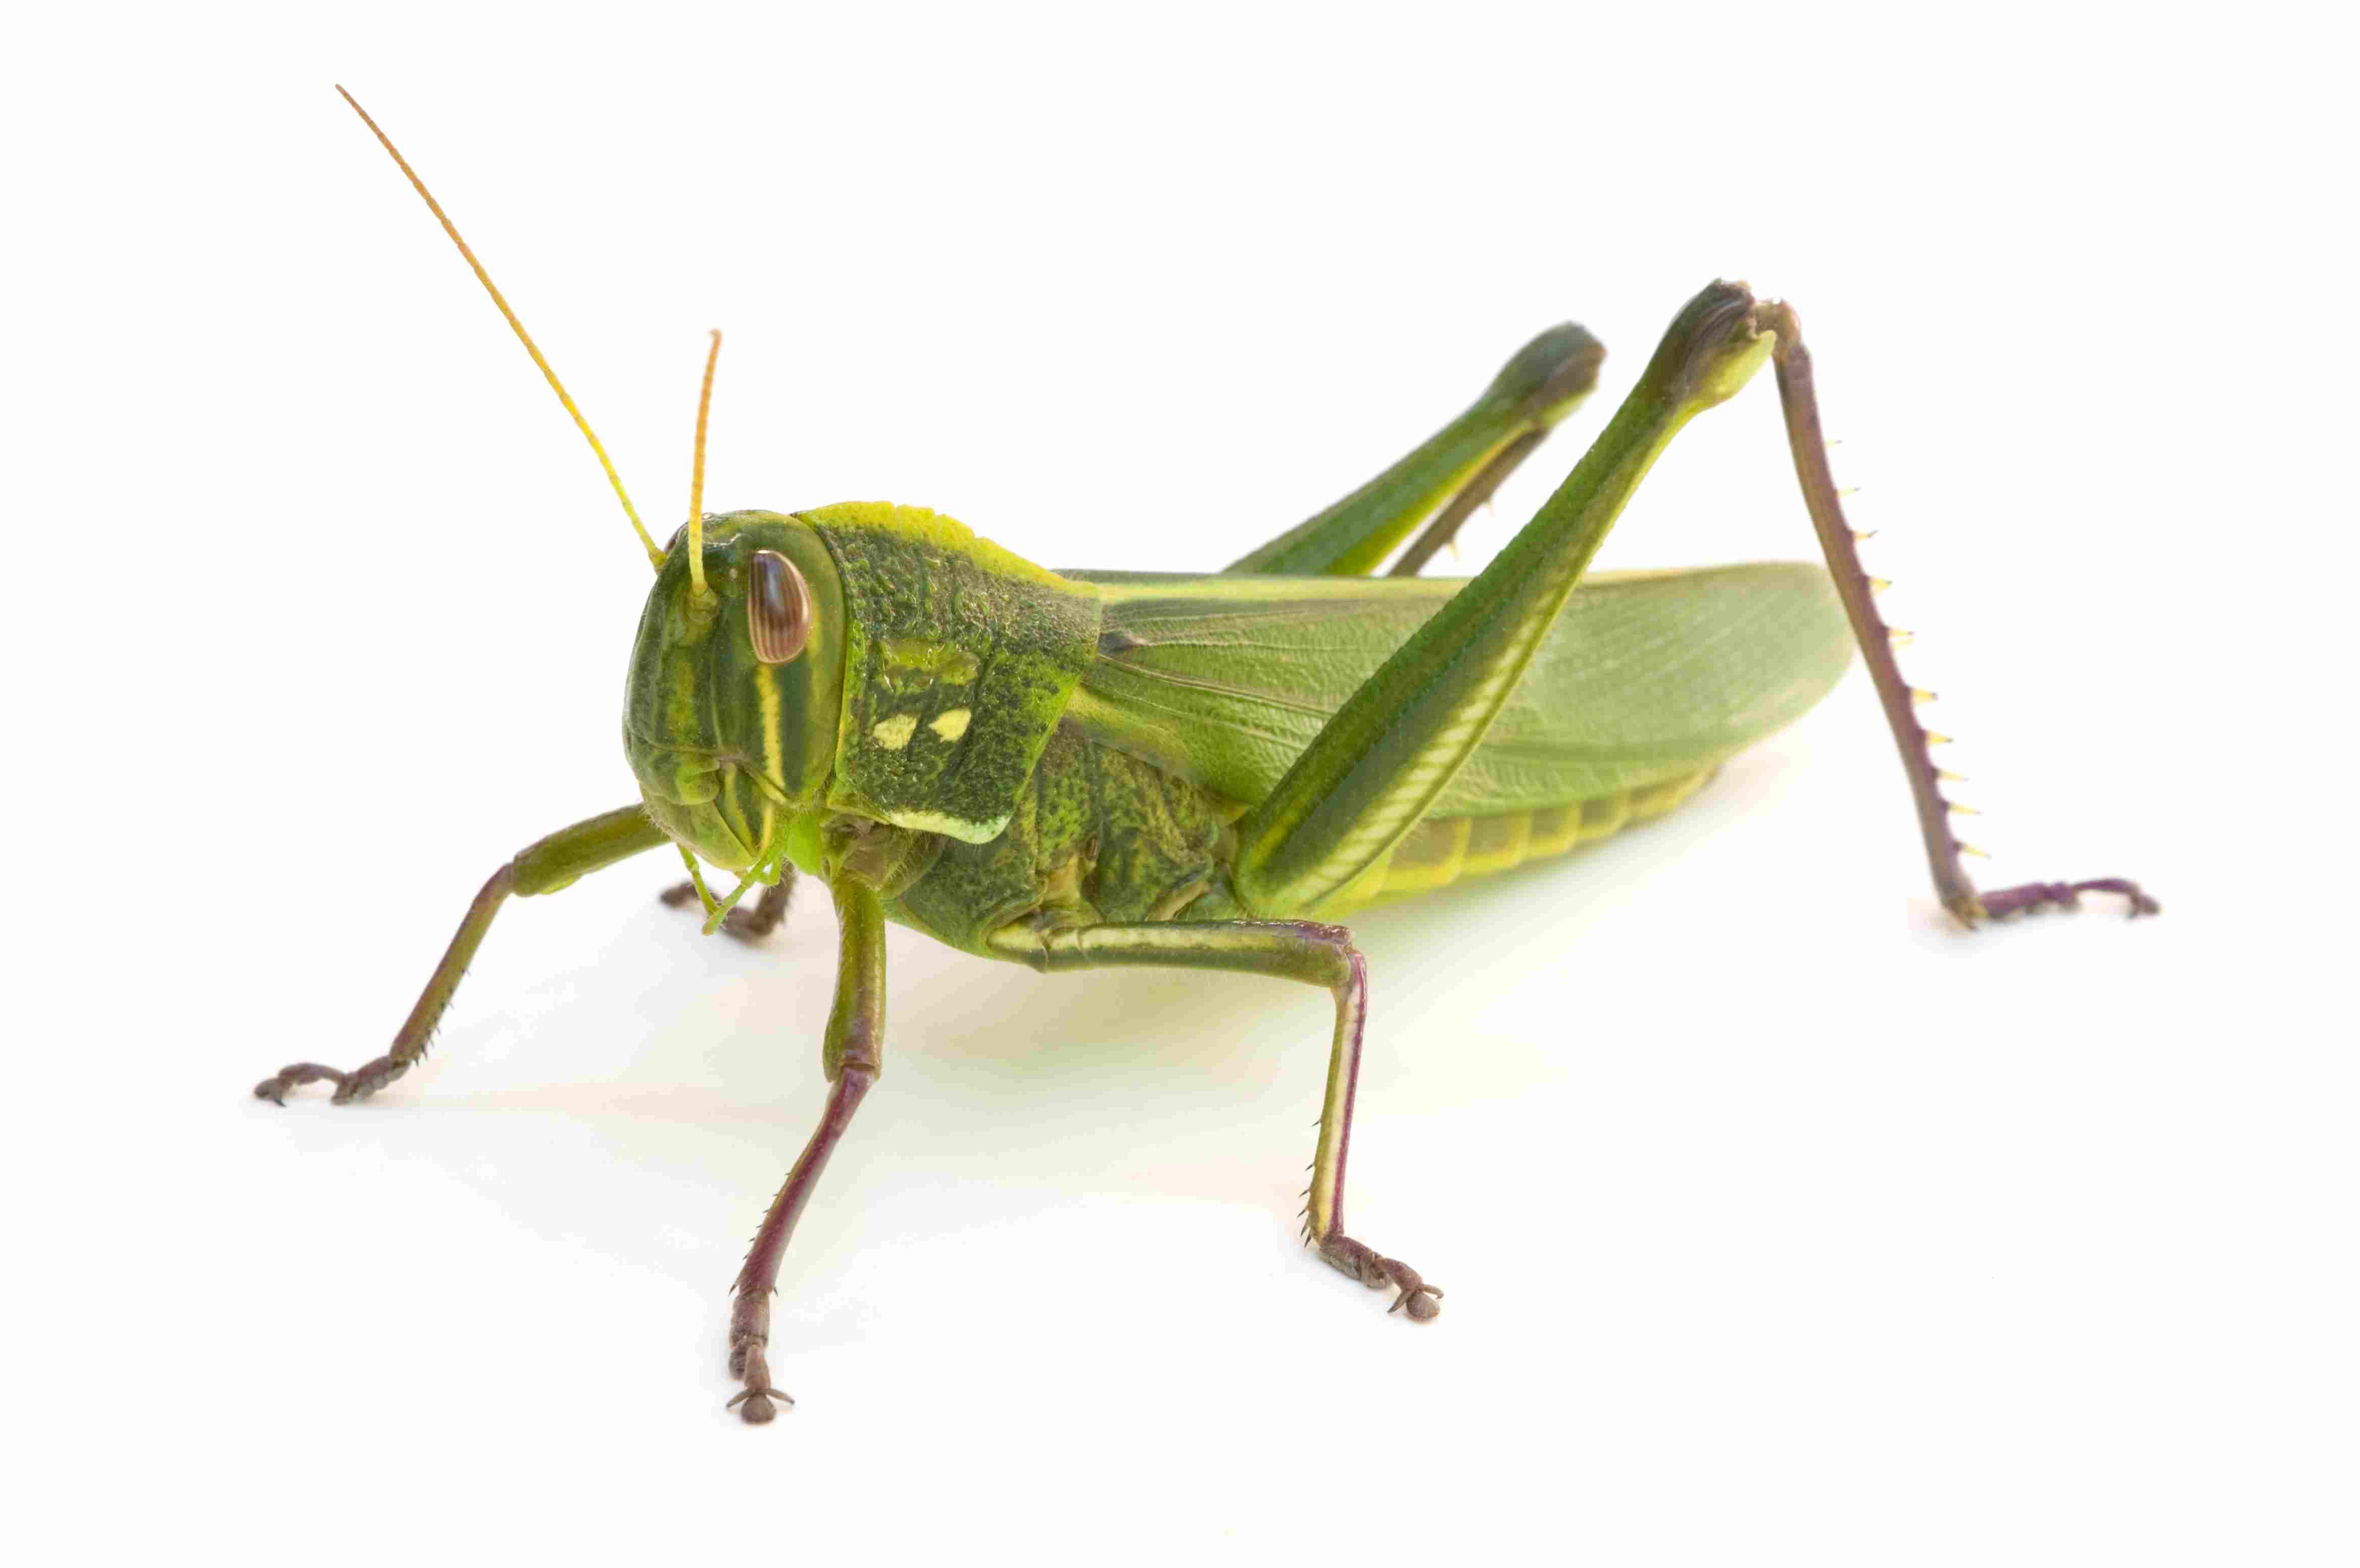 How Do Crickets, Grasshoppers, and Cicadas Sing?